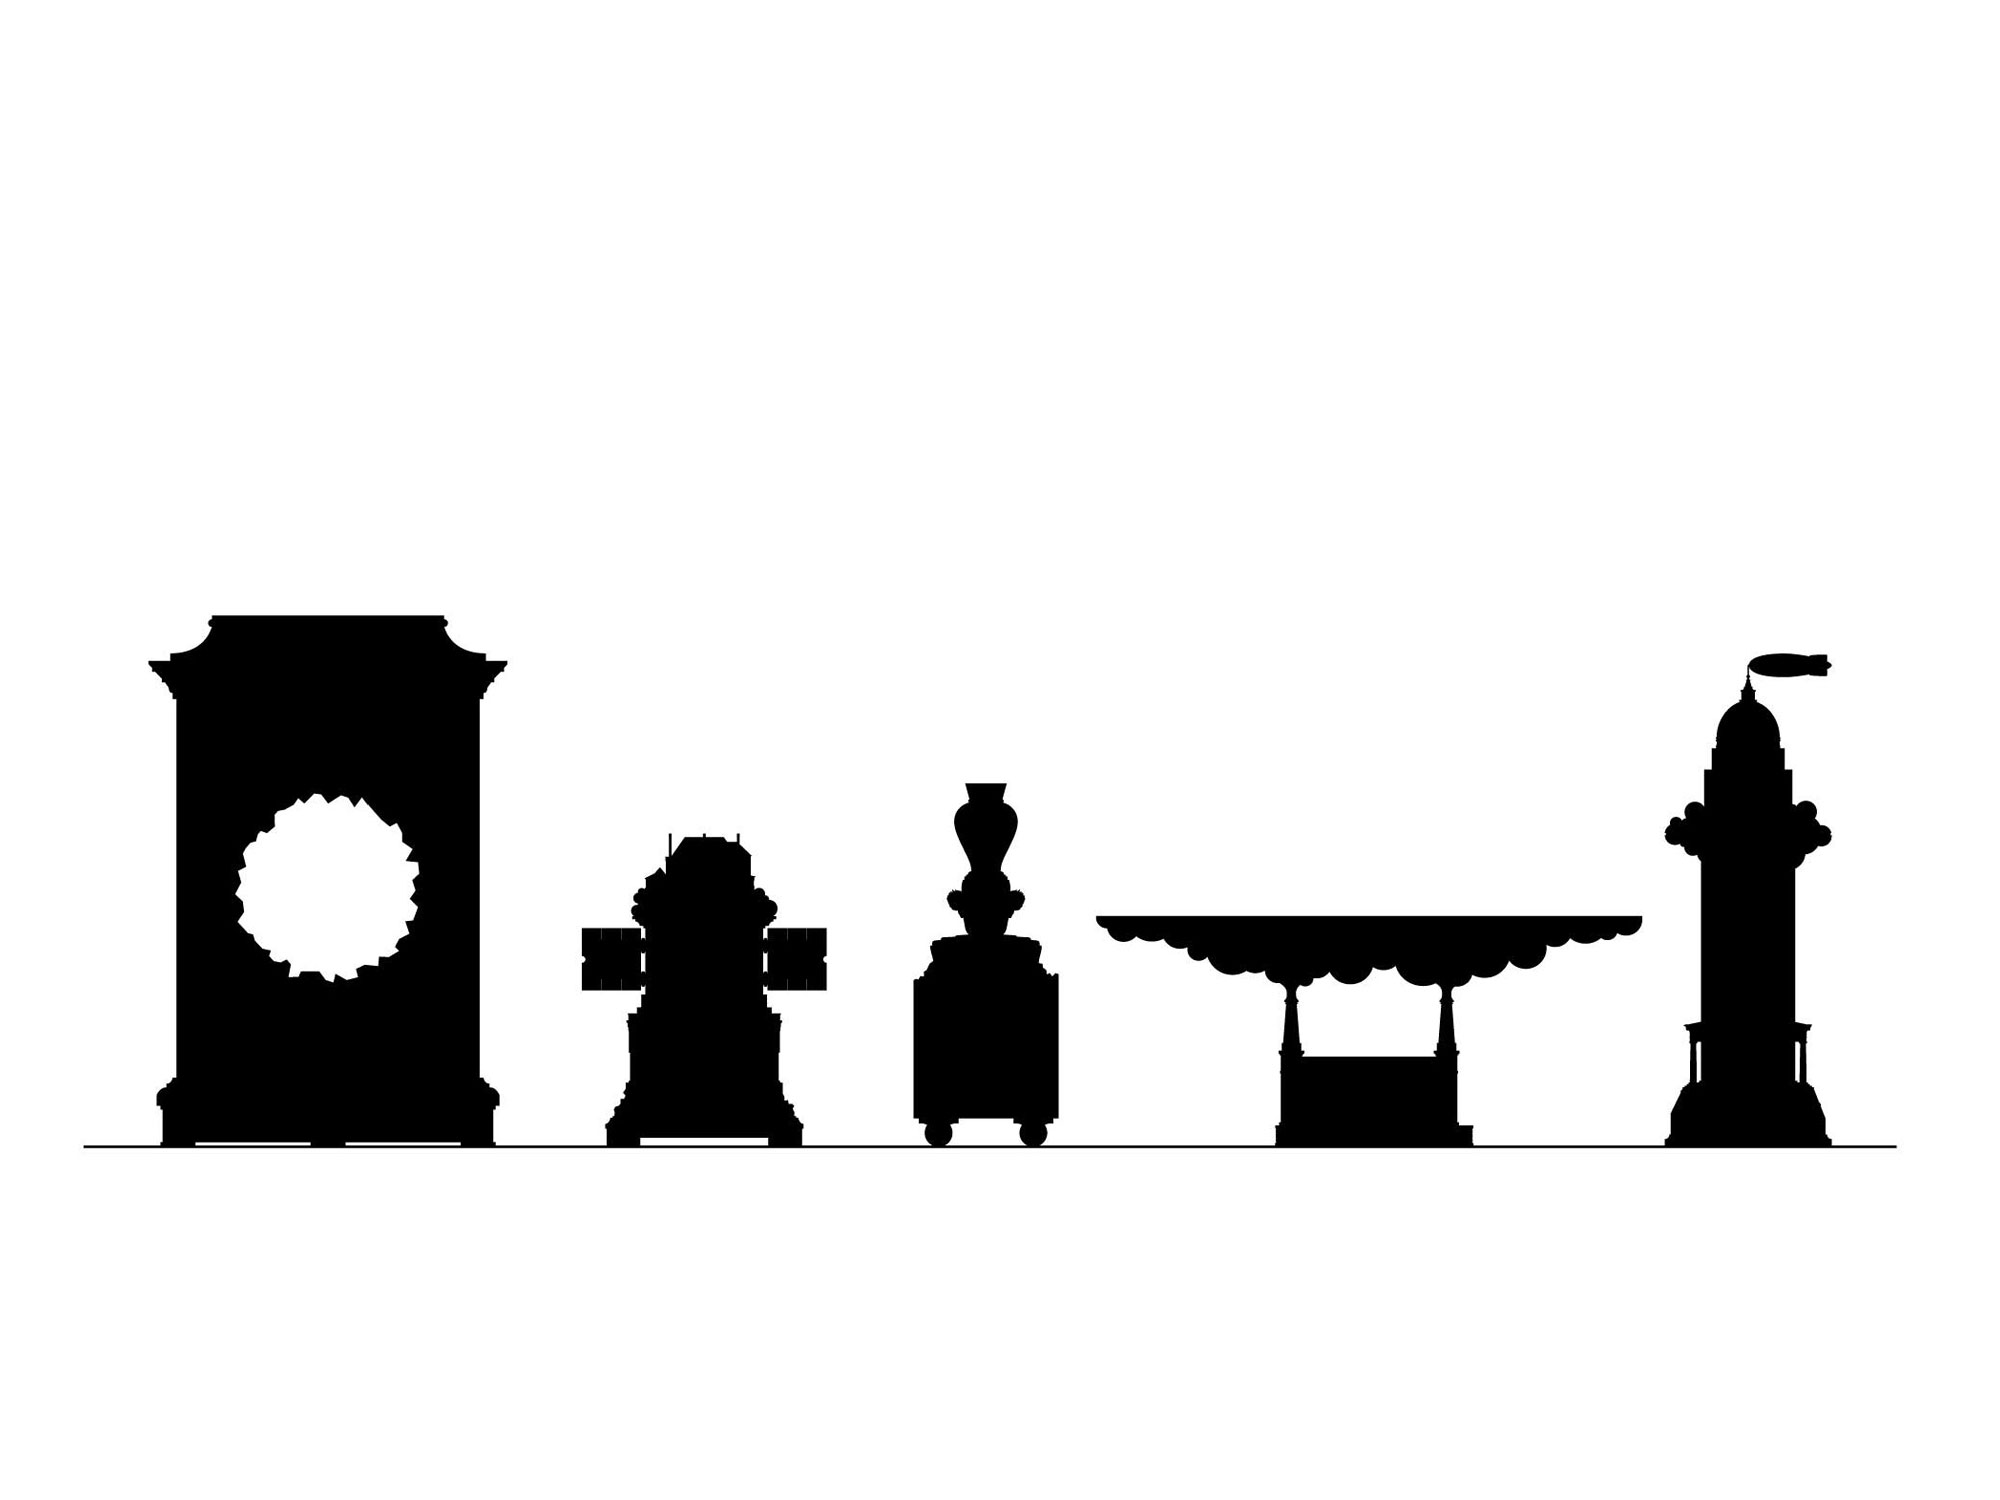 silhouettes-robber-baron-studio-job2